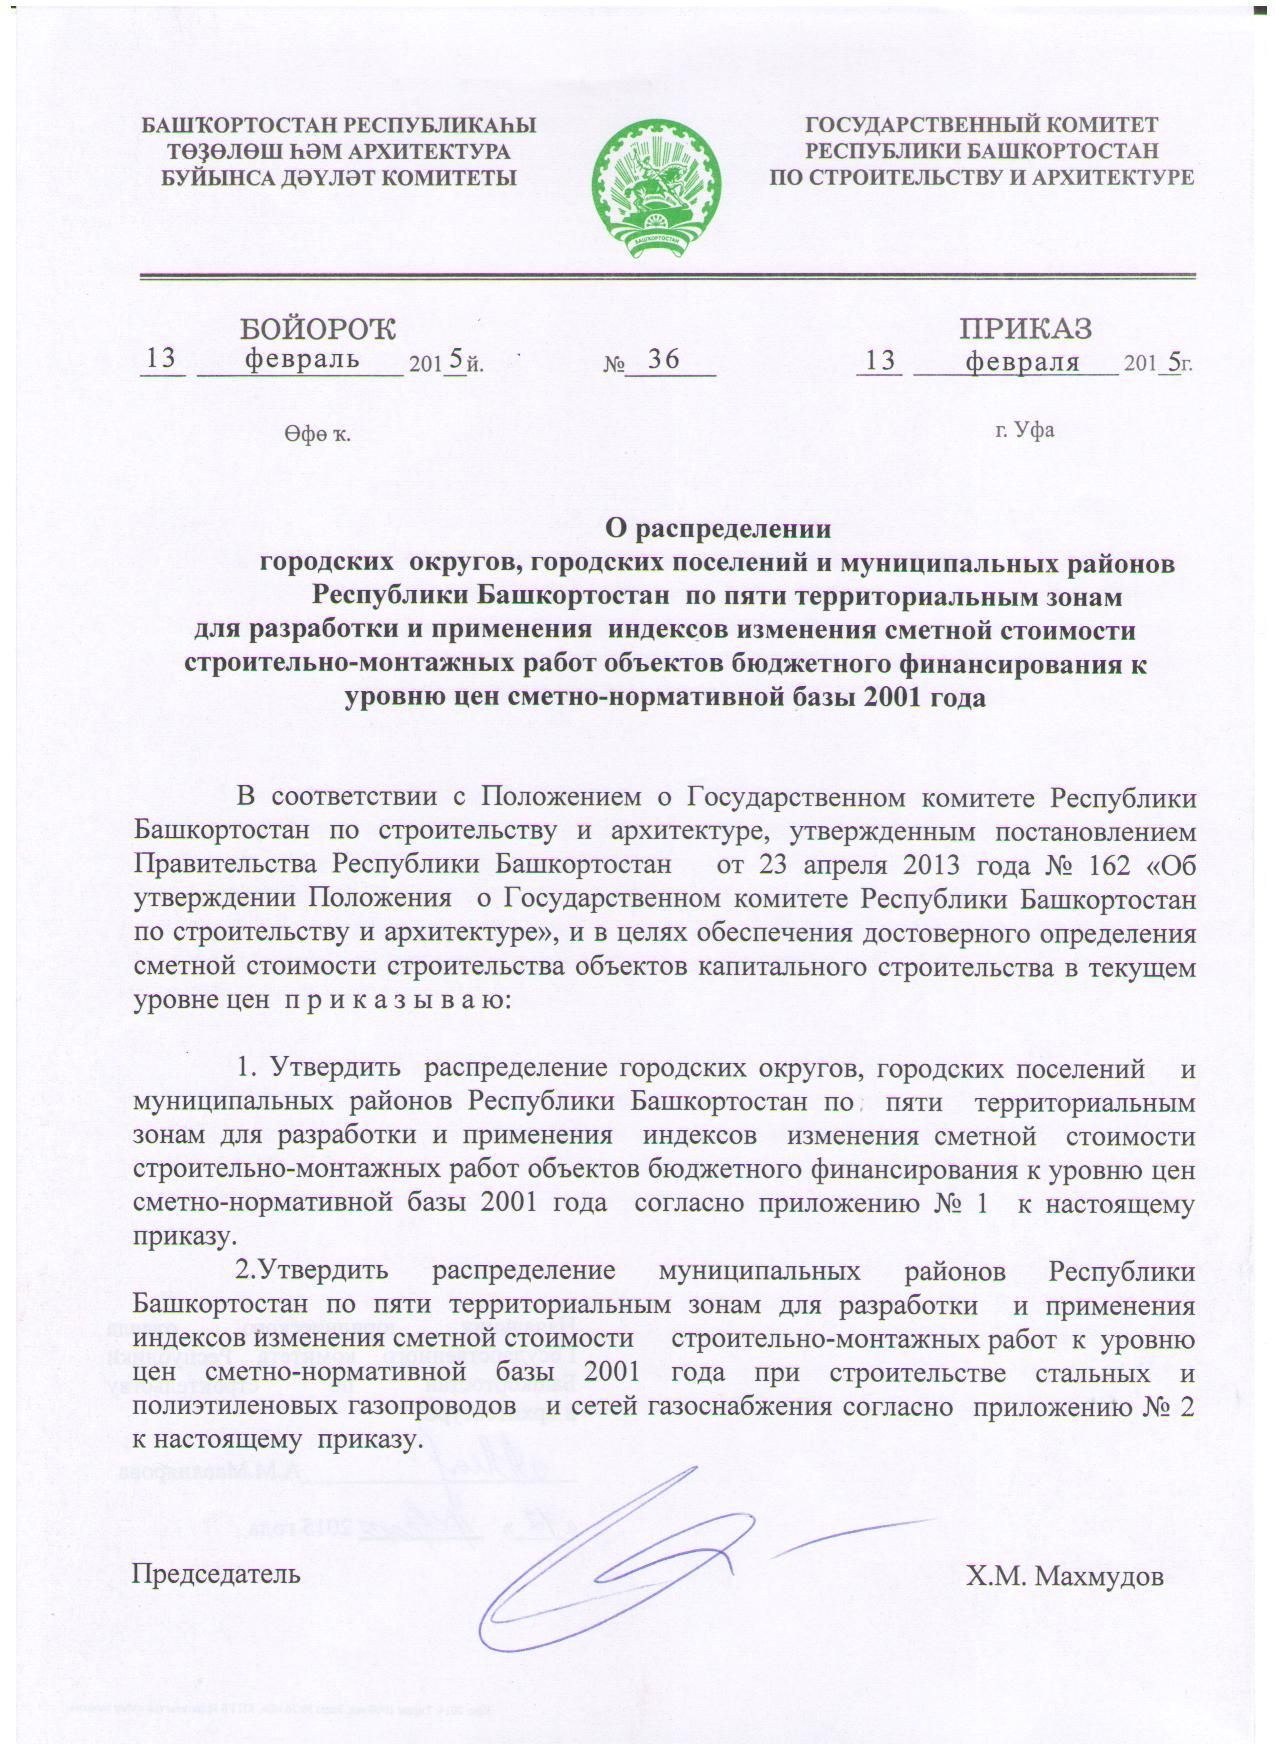 prikaz_36_po_pyati_territor_zonam.jpg